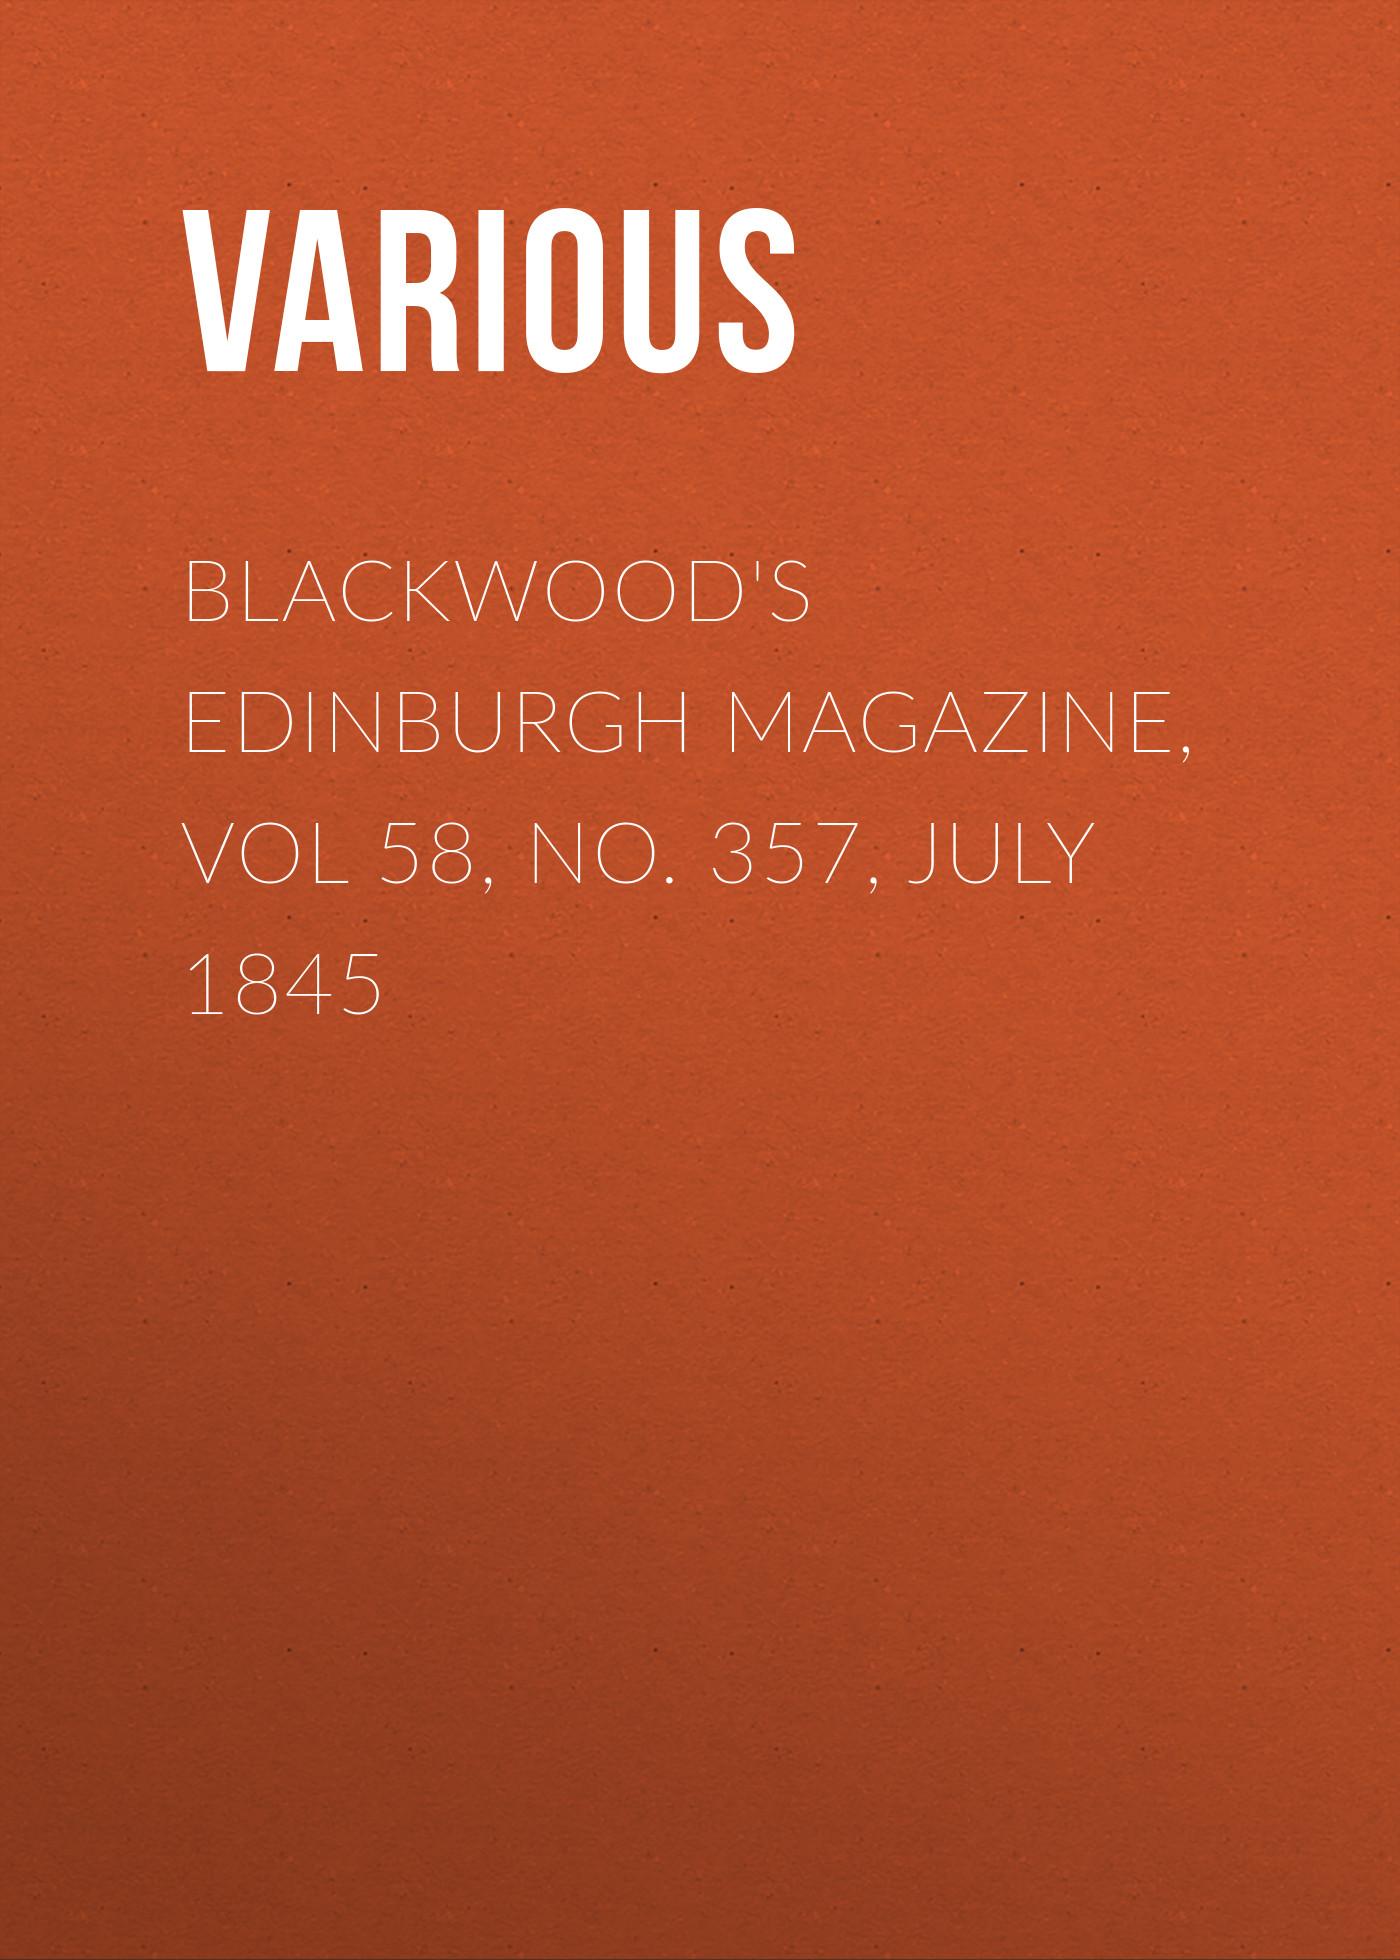 Various Blackwood's Edinburgh Magazine, Vol 58, No. 357, July 1845 various blackwood s edinburgh magazine no 404 june 1849